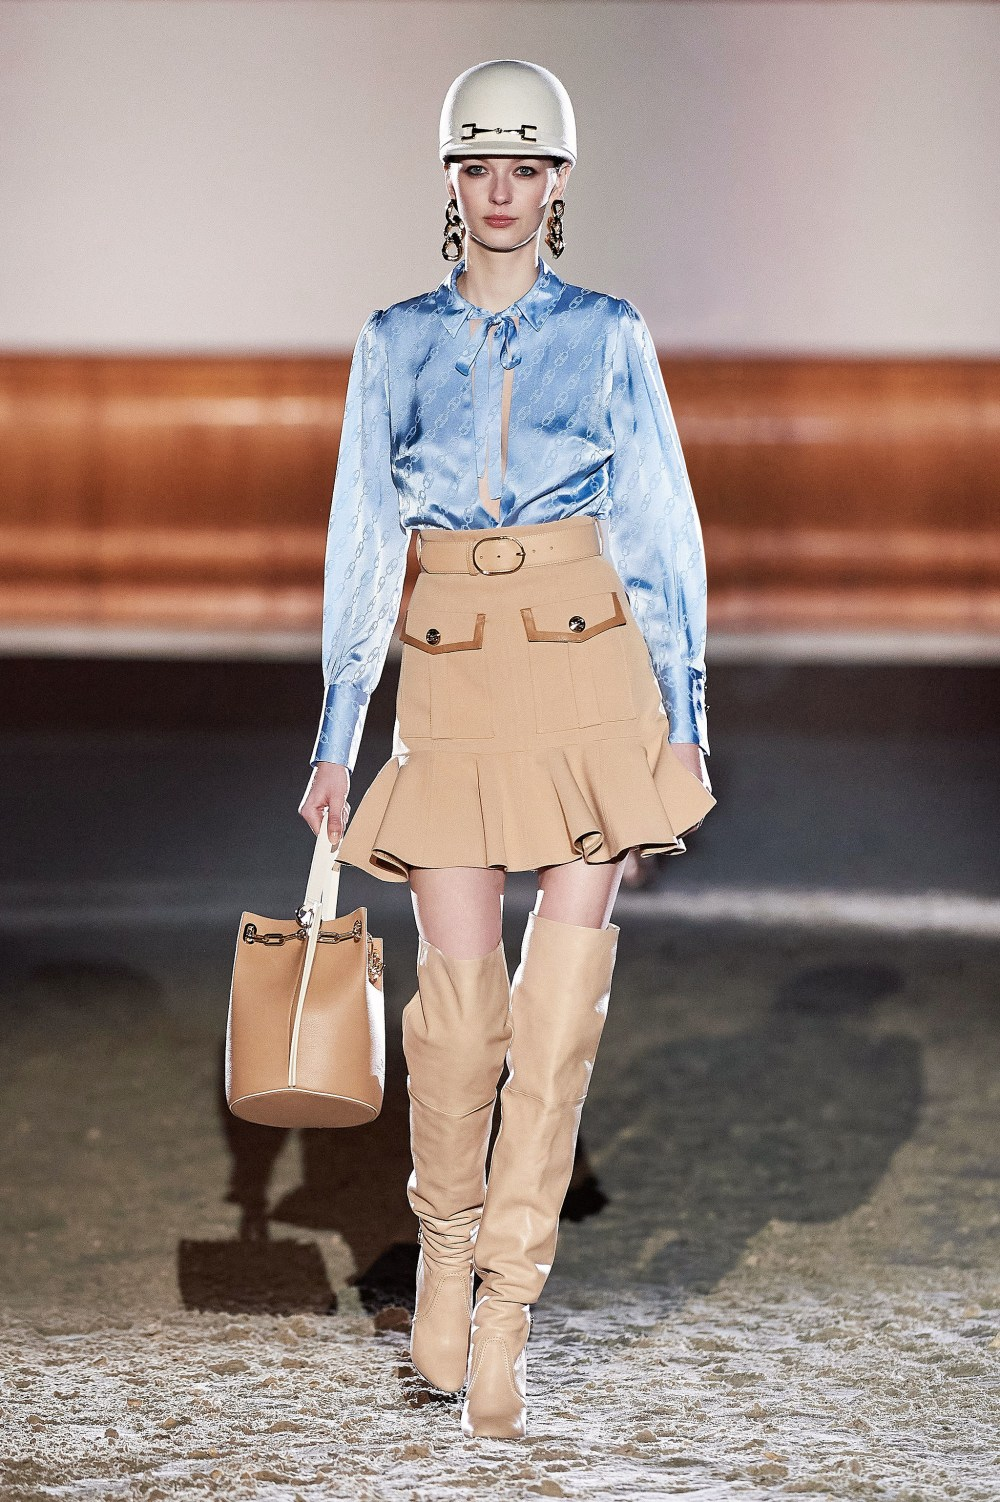 Elisabetta Franchi: Elisabetta Franchi Fall Winter 2021-22 Fashion Show Photo #8